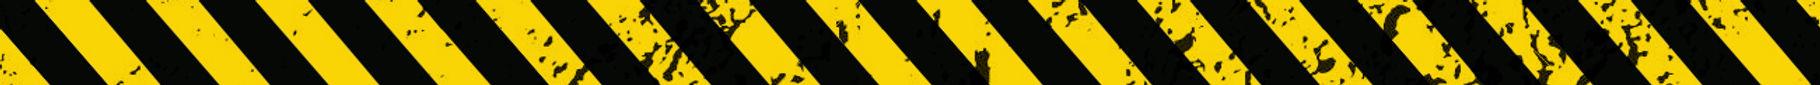 caution tape.jpg